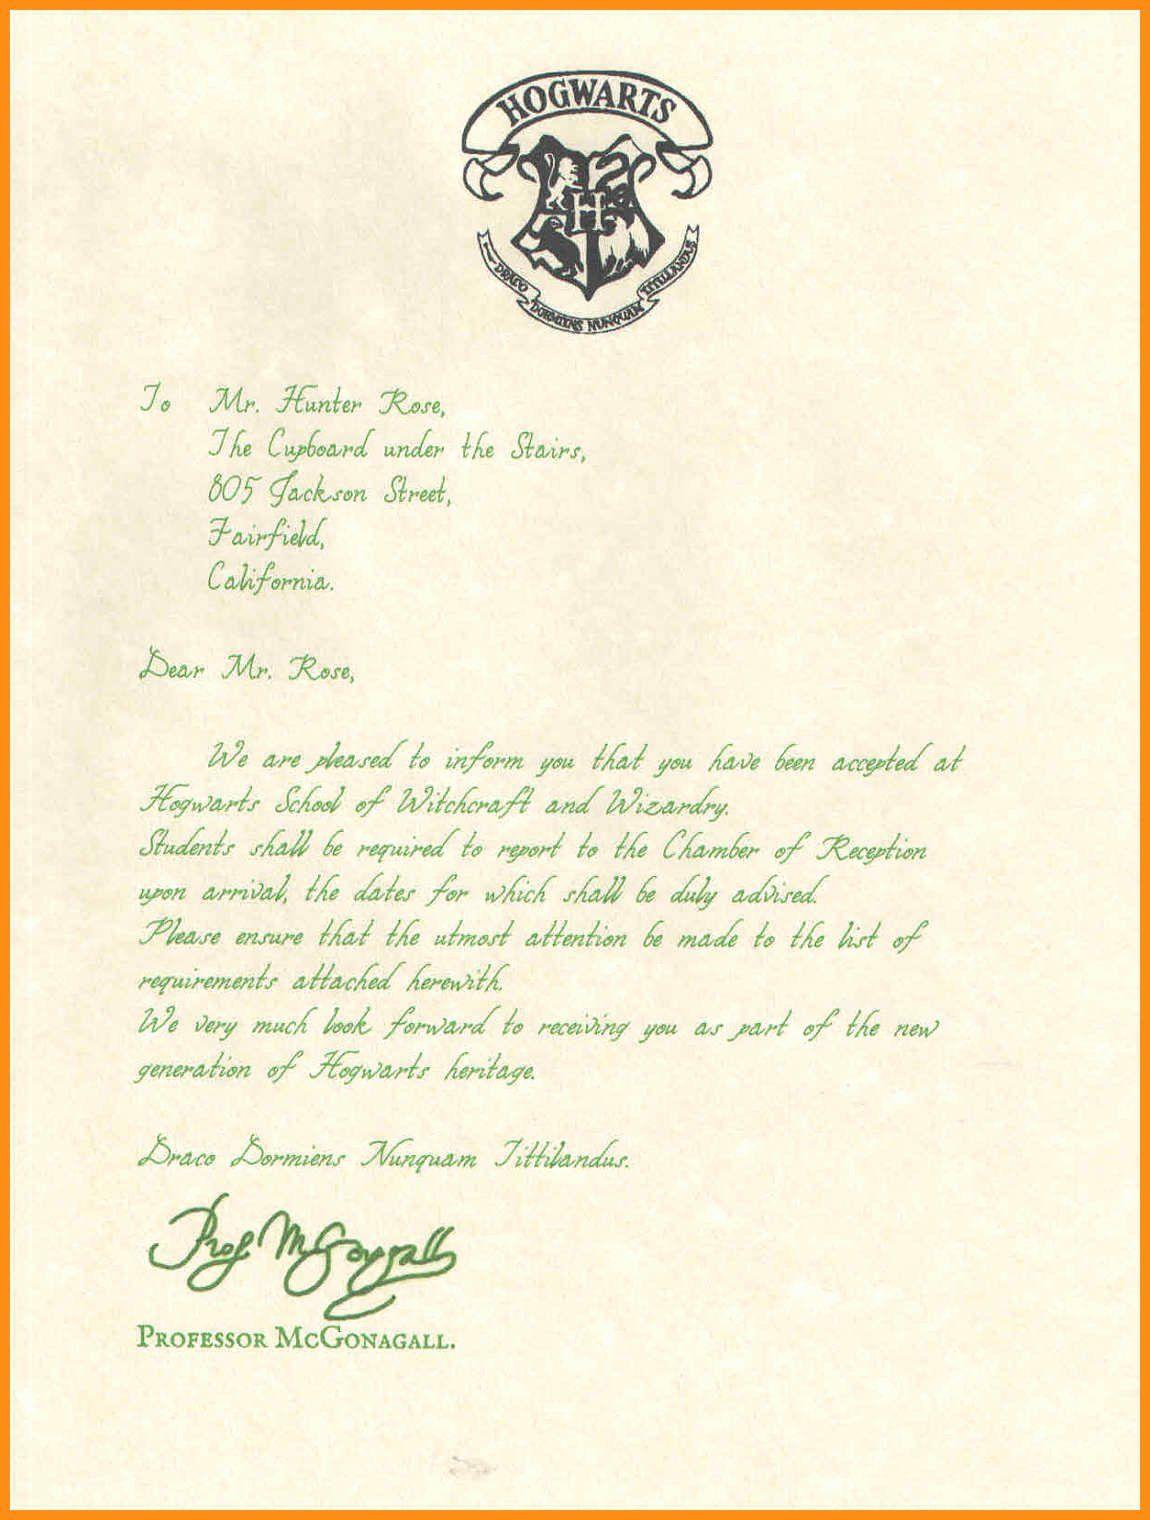 40 Harry Potter Letter Template in 2020 Hogwarts